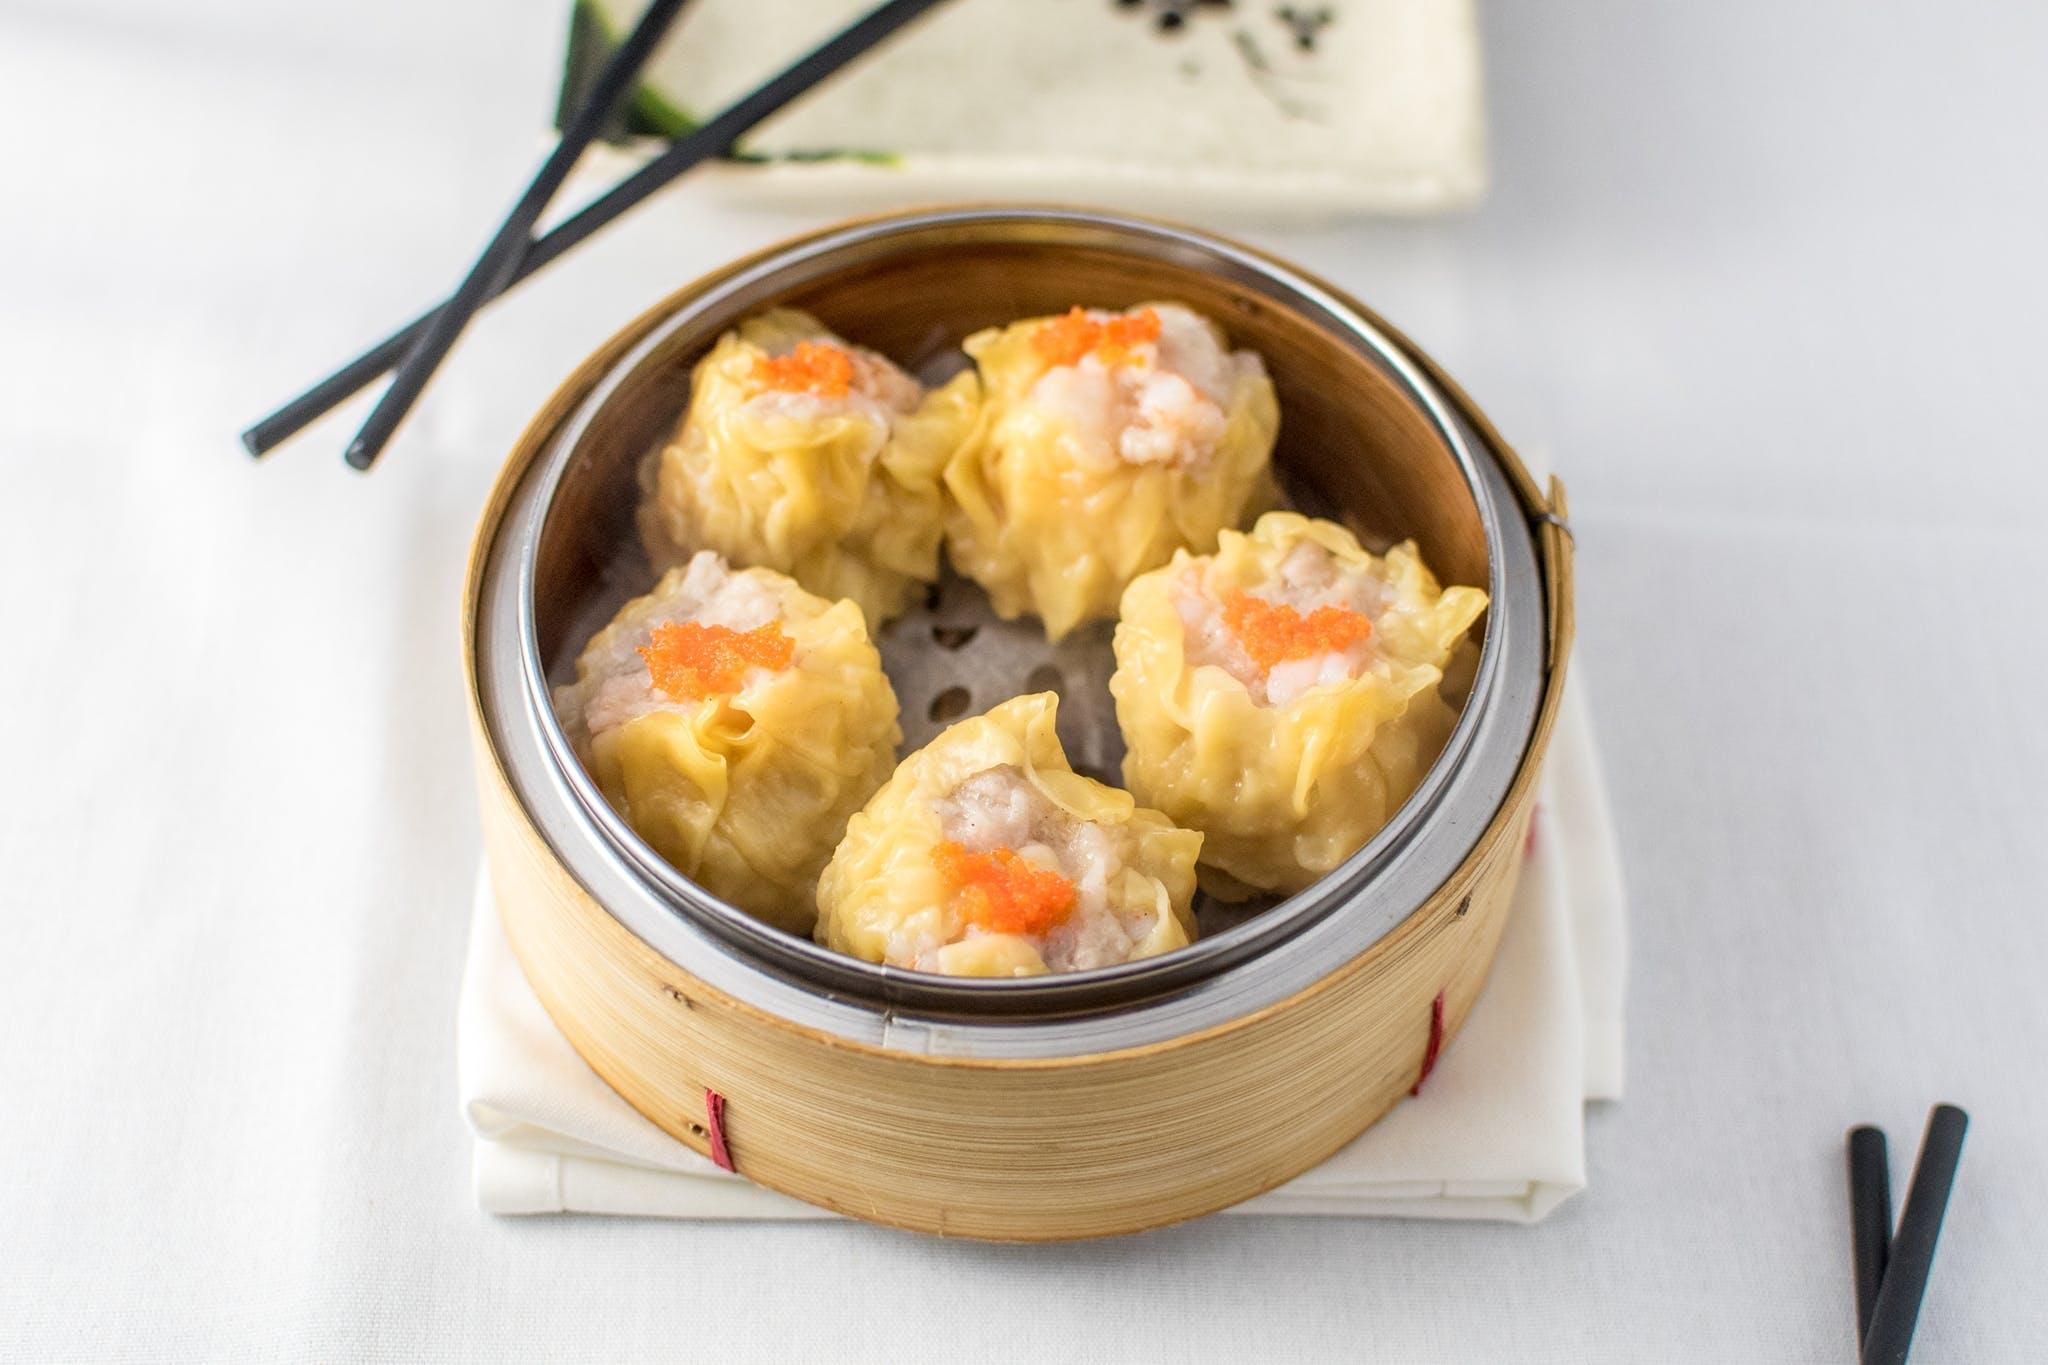 02. Siu Mai (Pork & Shrimp Dumpling) from Nani Restaurant in Madison, WI